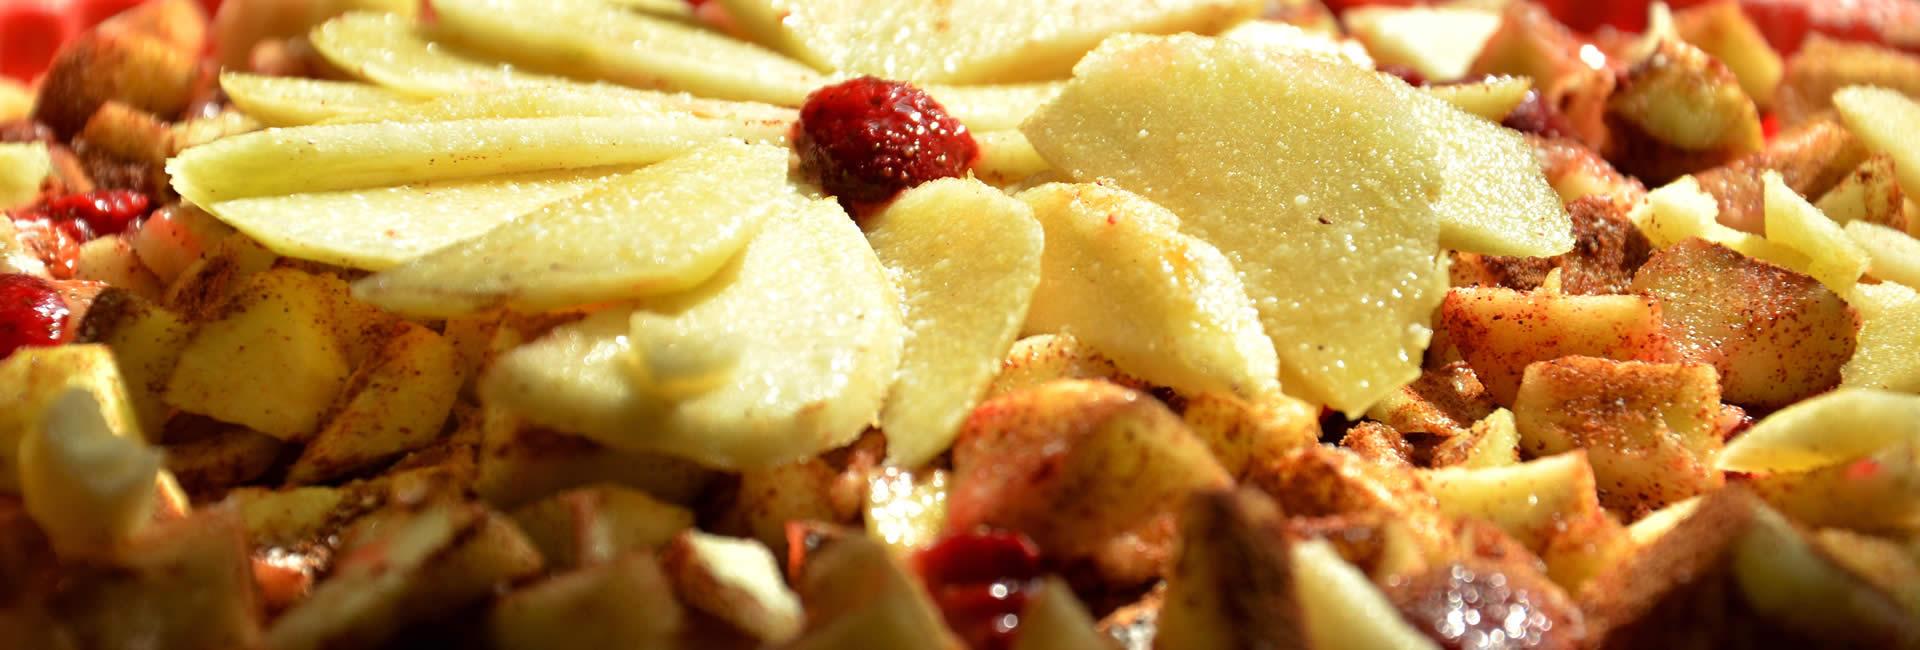 dietologi cremona - torta crostata